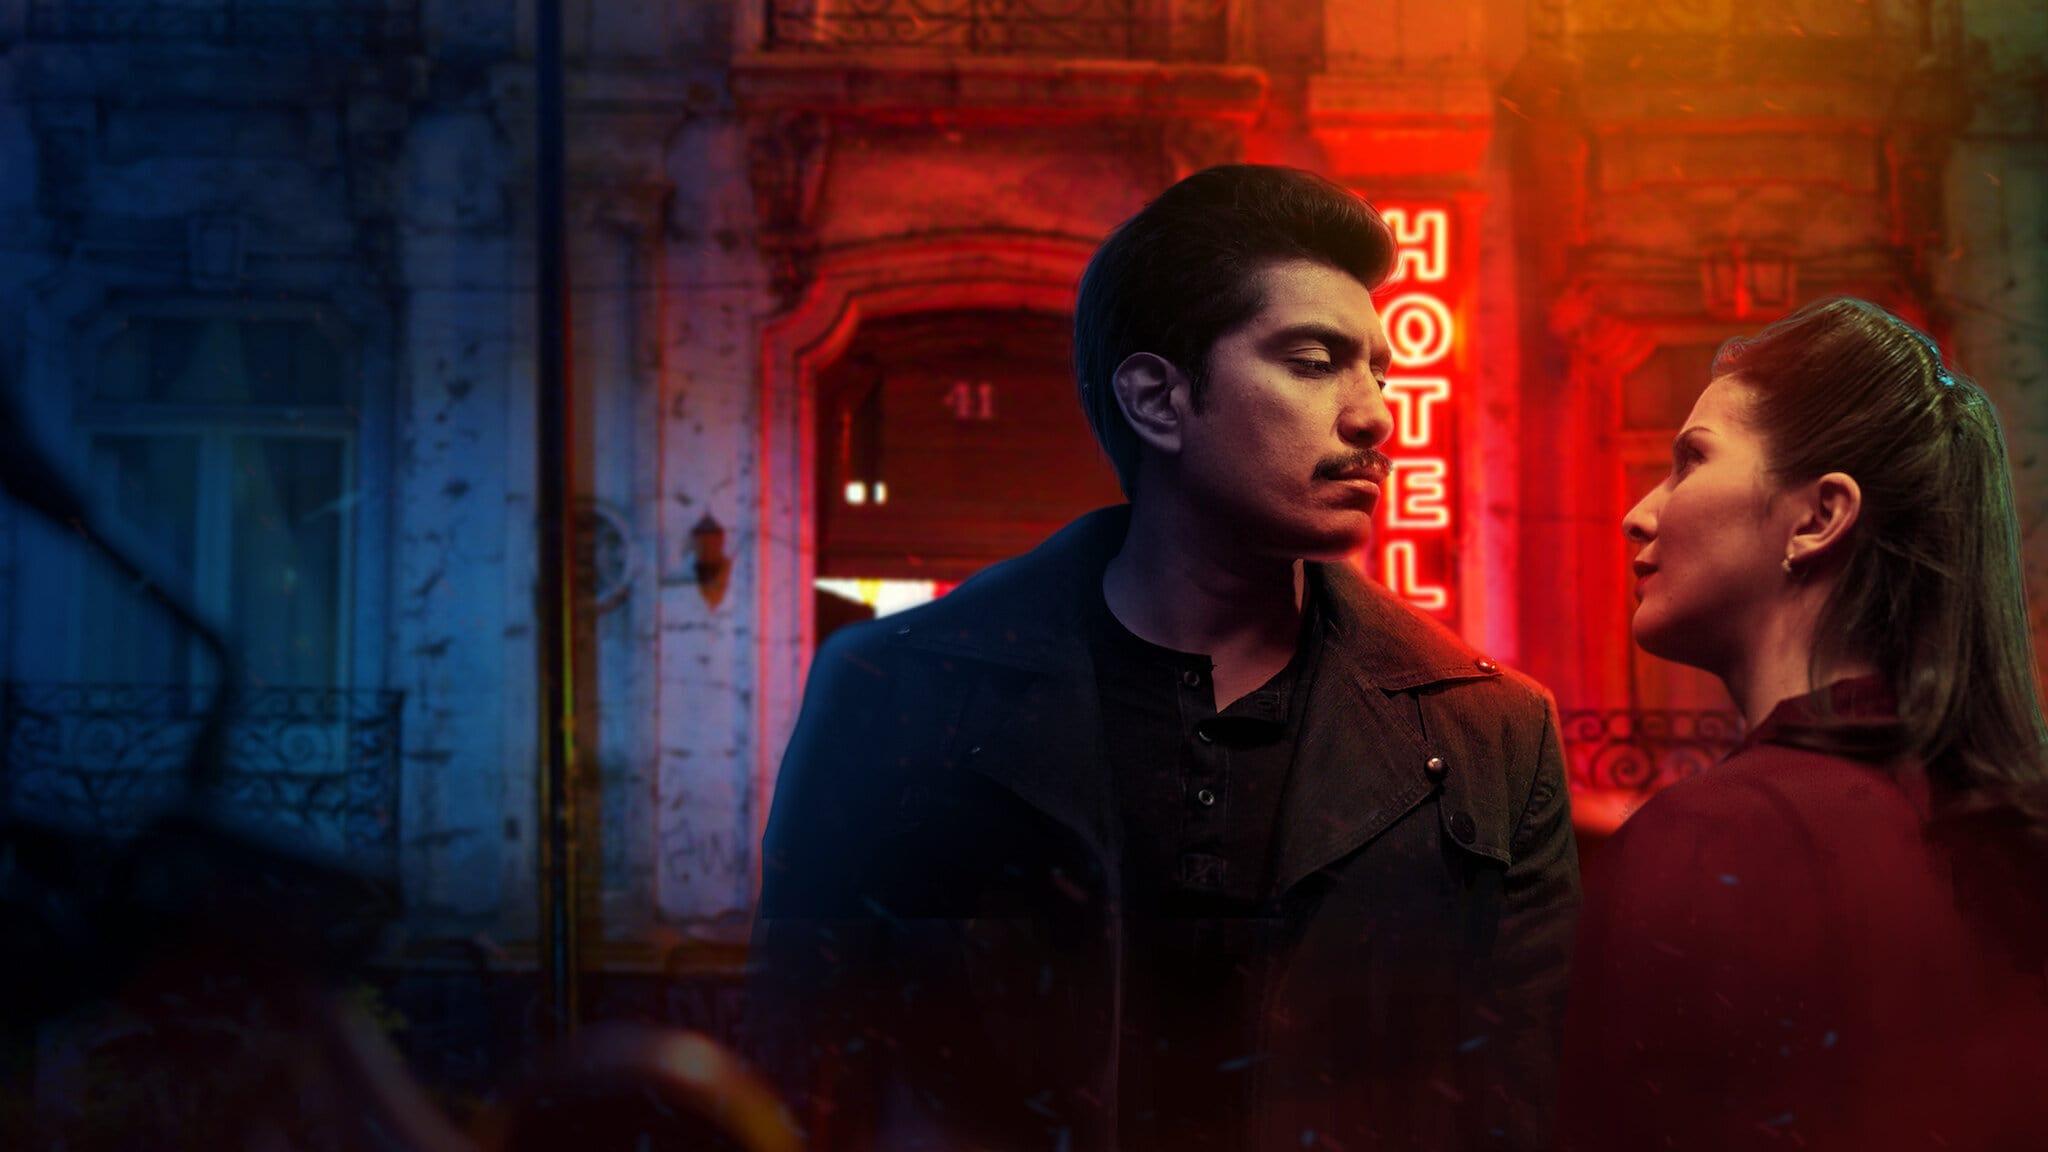 720p~ Dark Forces Season 1 episode 1 Premieres